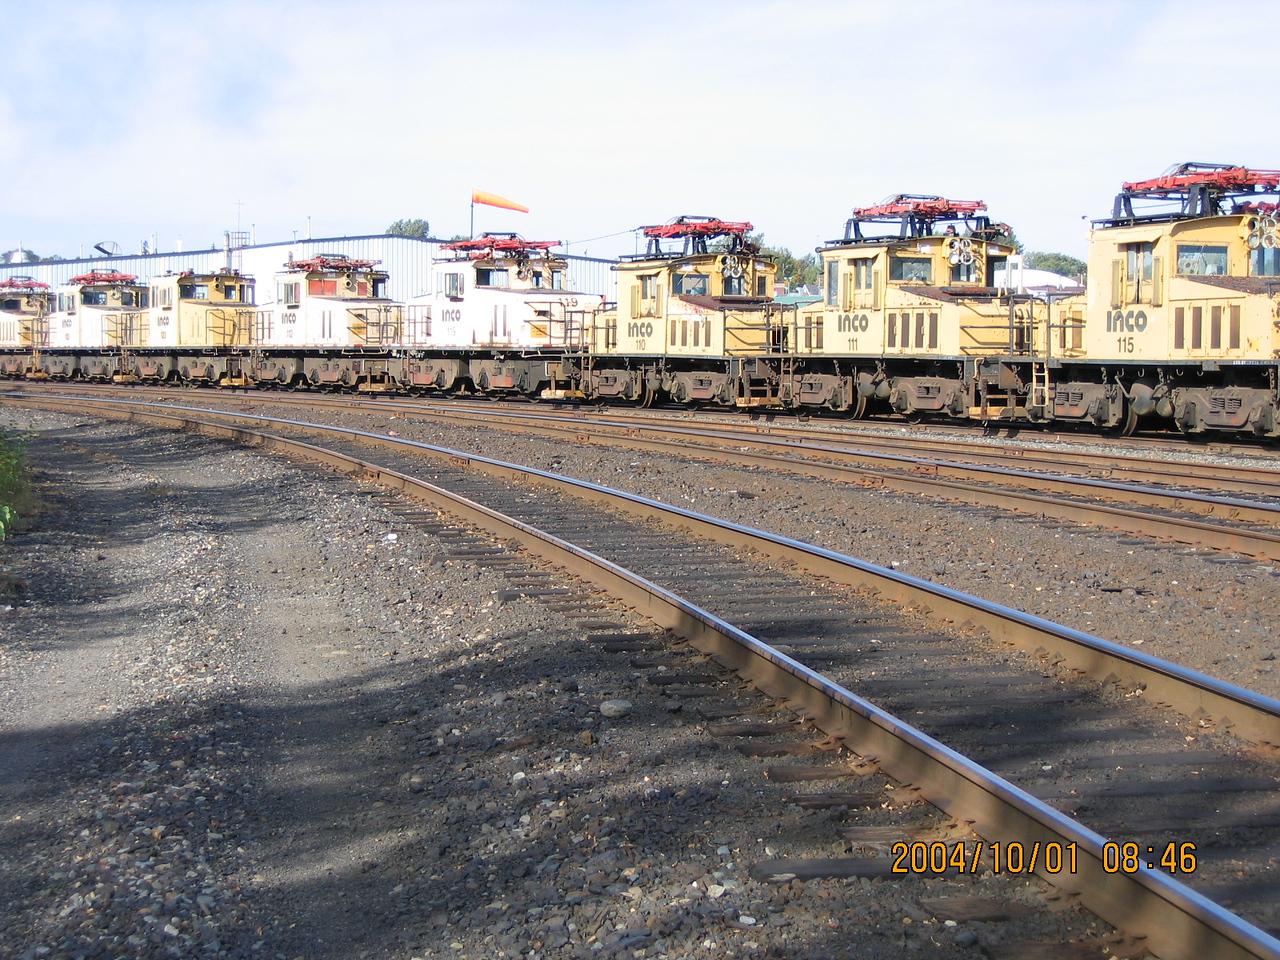 Canadian Pacific Railway - Sudbury, Ontario - Old Inco units